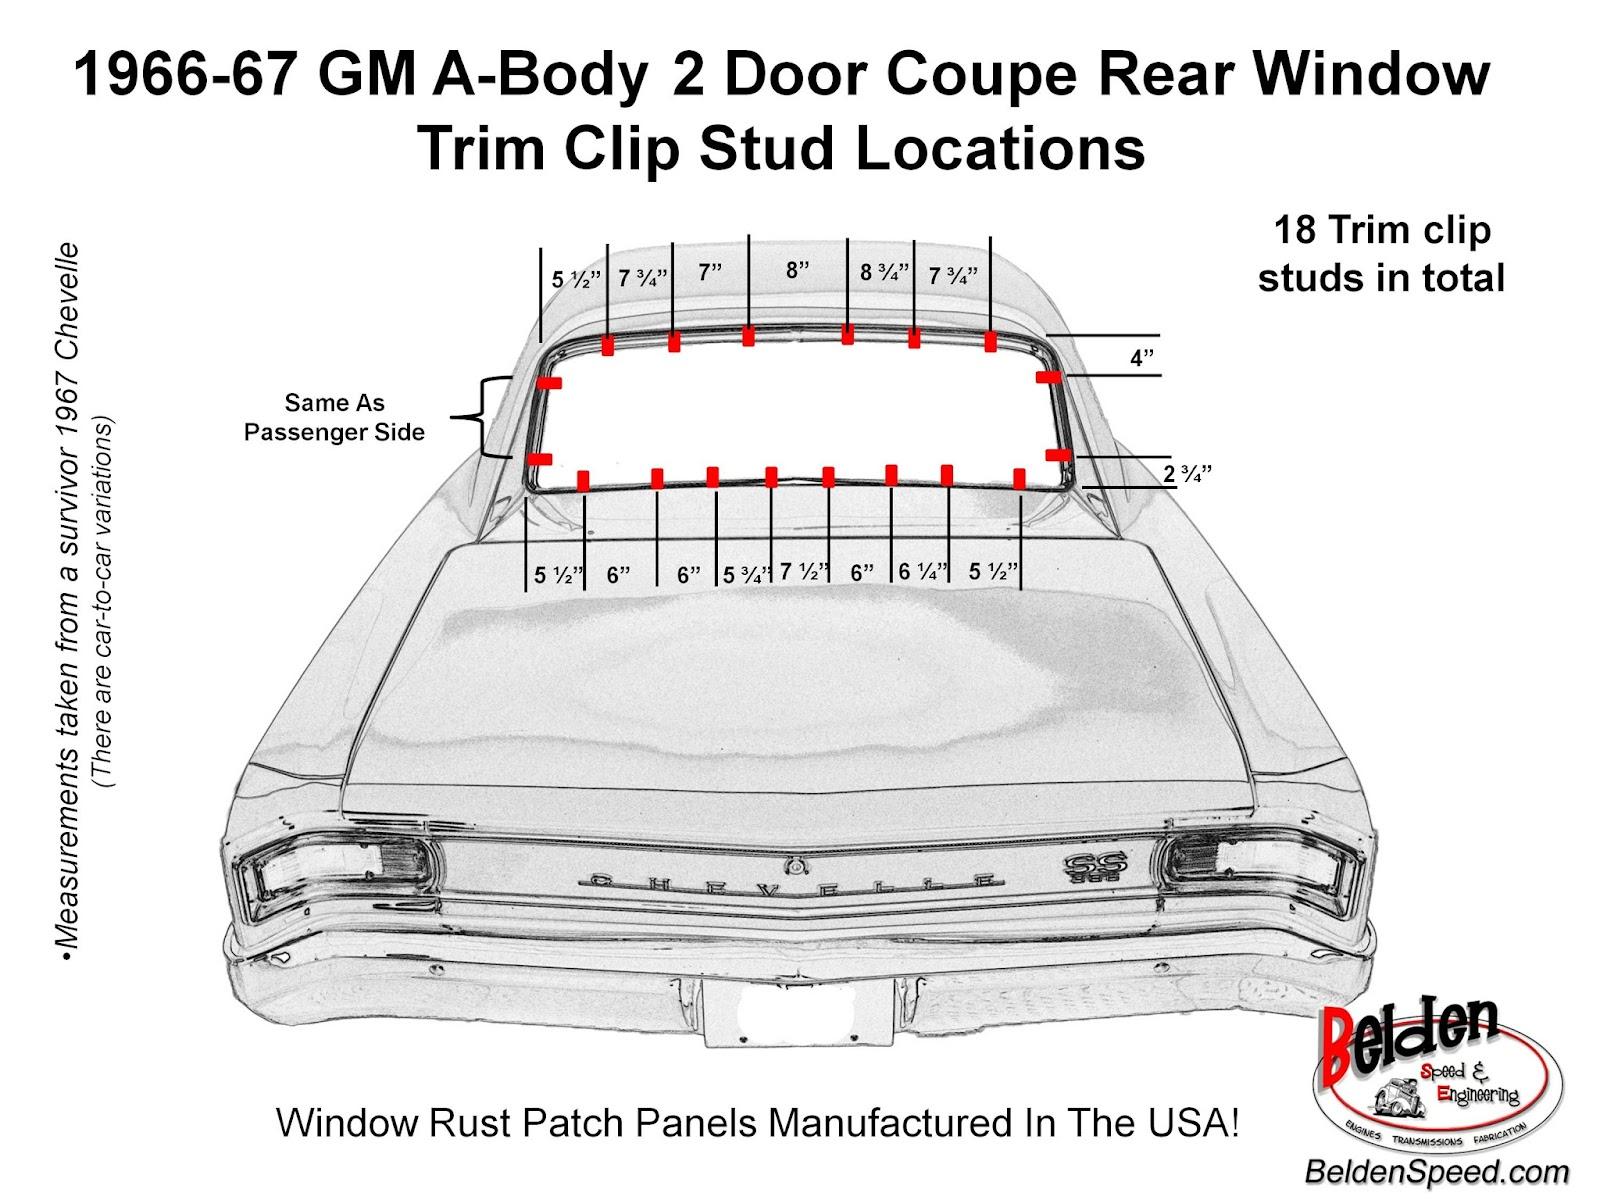 1967 Chevelle Diagram 1966 Wiring Online Rear Window Trim Clip Stud Location Rh Beldenspeed Com Pdf Fuse Box